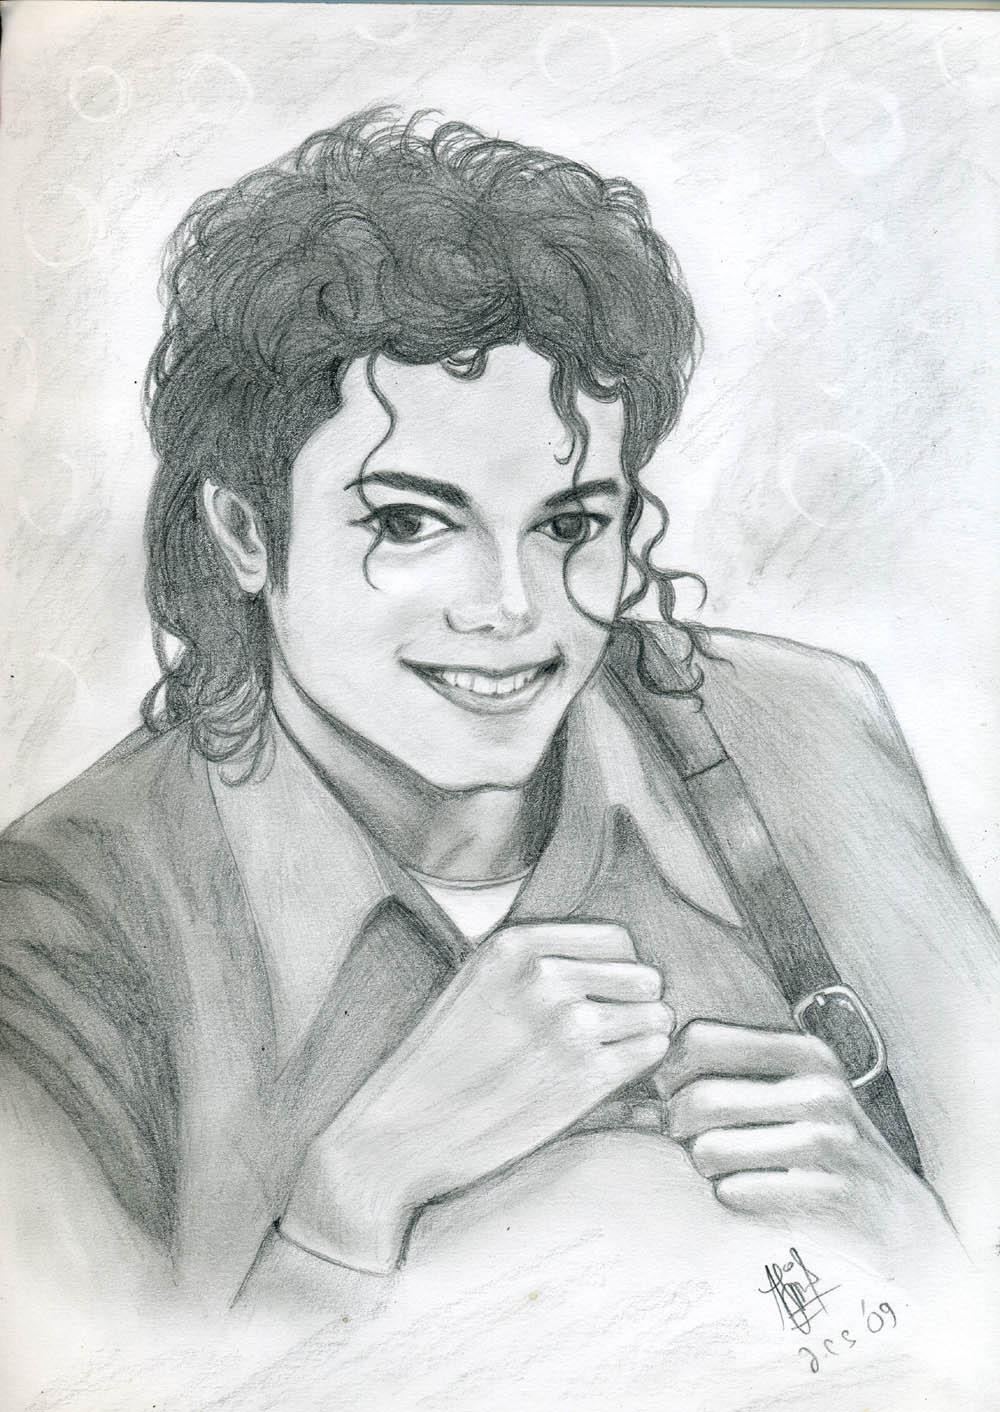 Michael Jackson's smile by JennieLuv